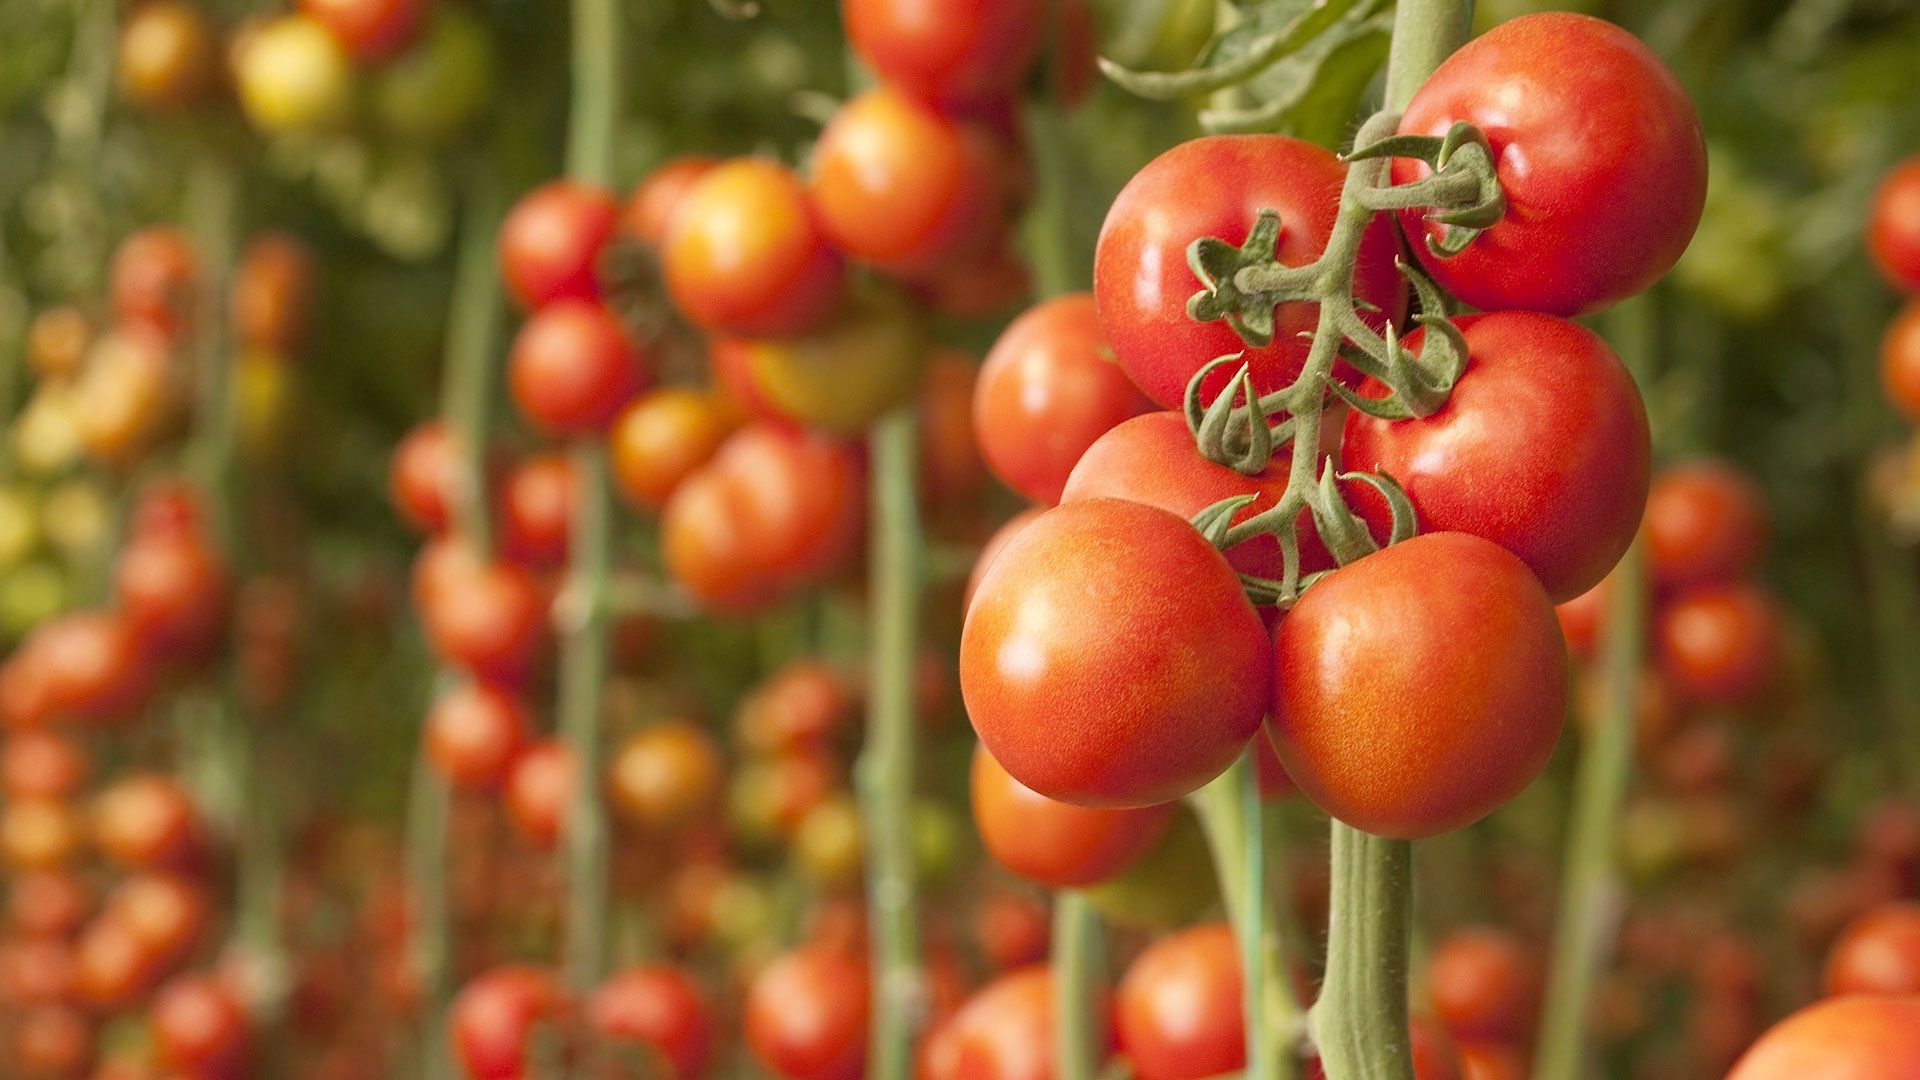 Picking rules for tomato seedlings